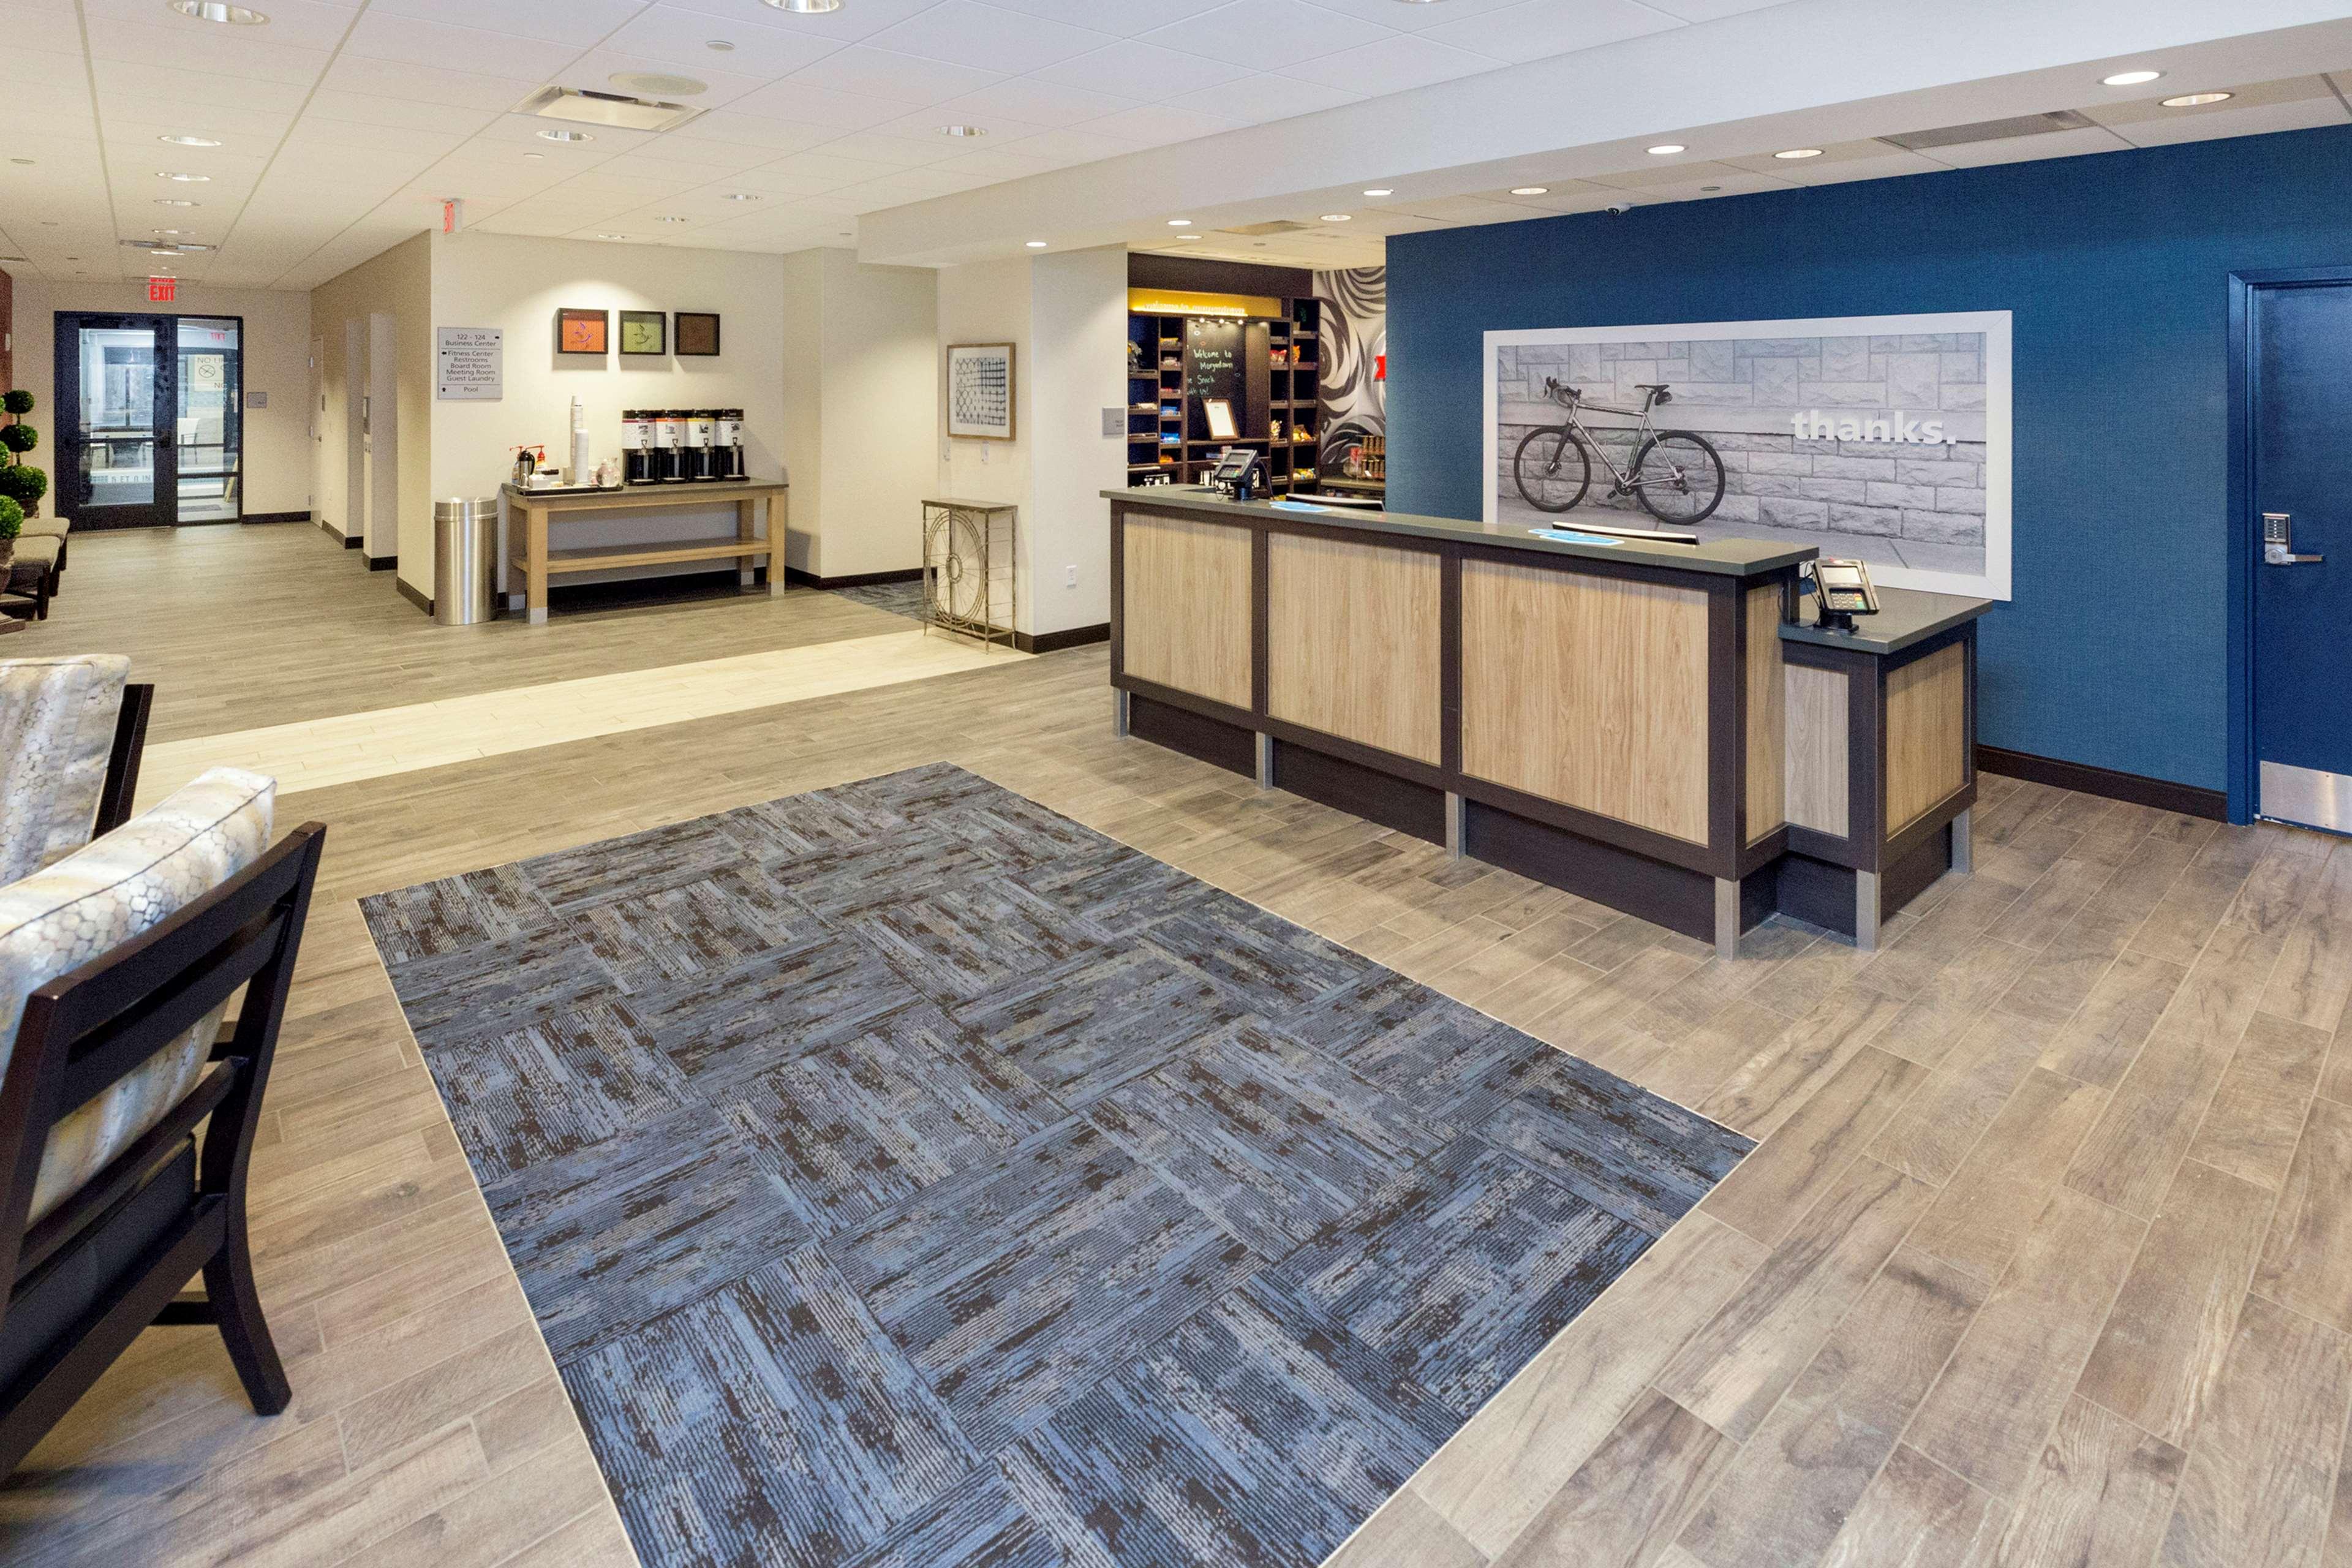 Hampton Inn & Suites Morgantown / University Town Centre image 1